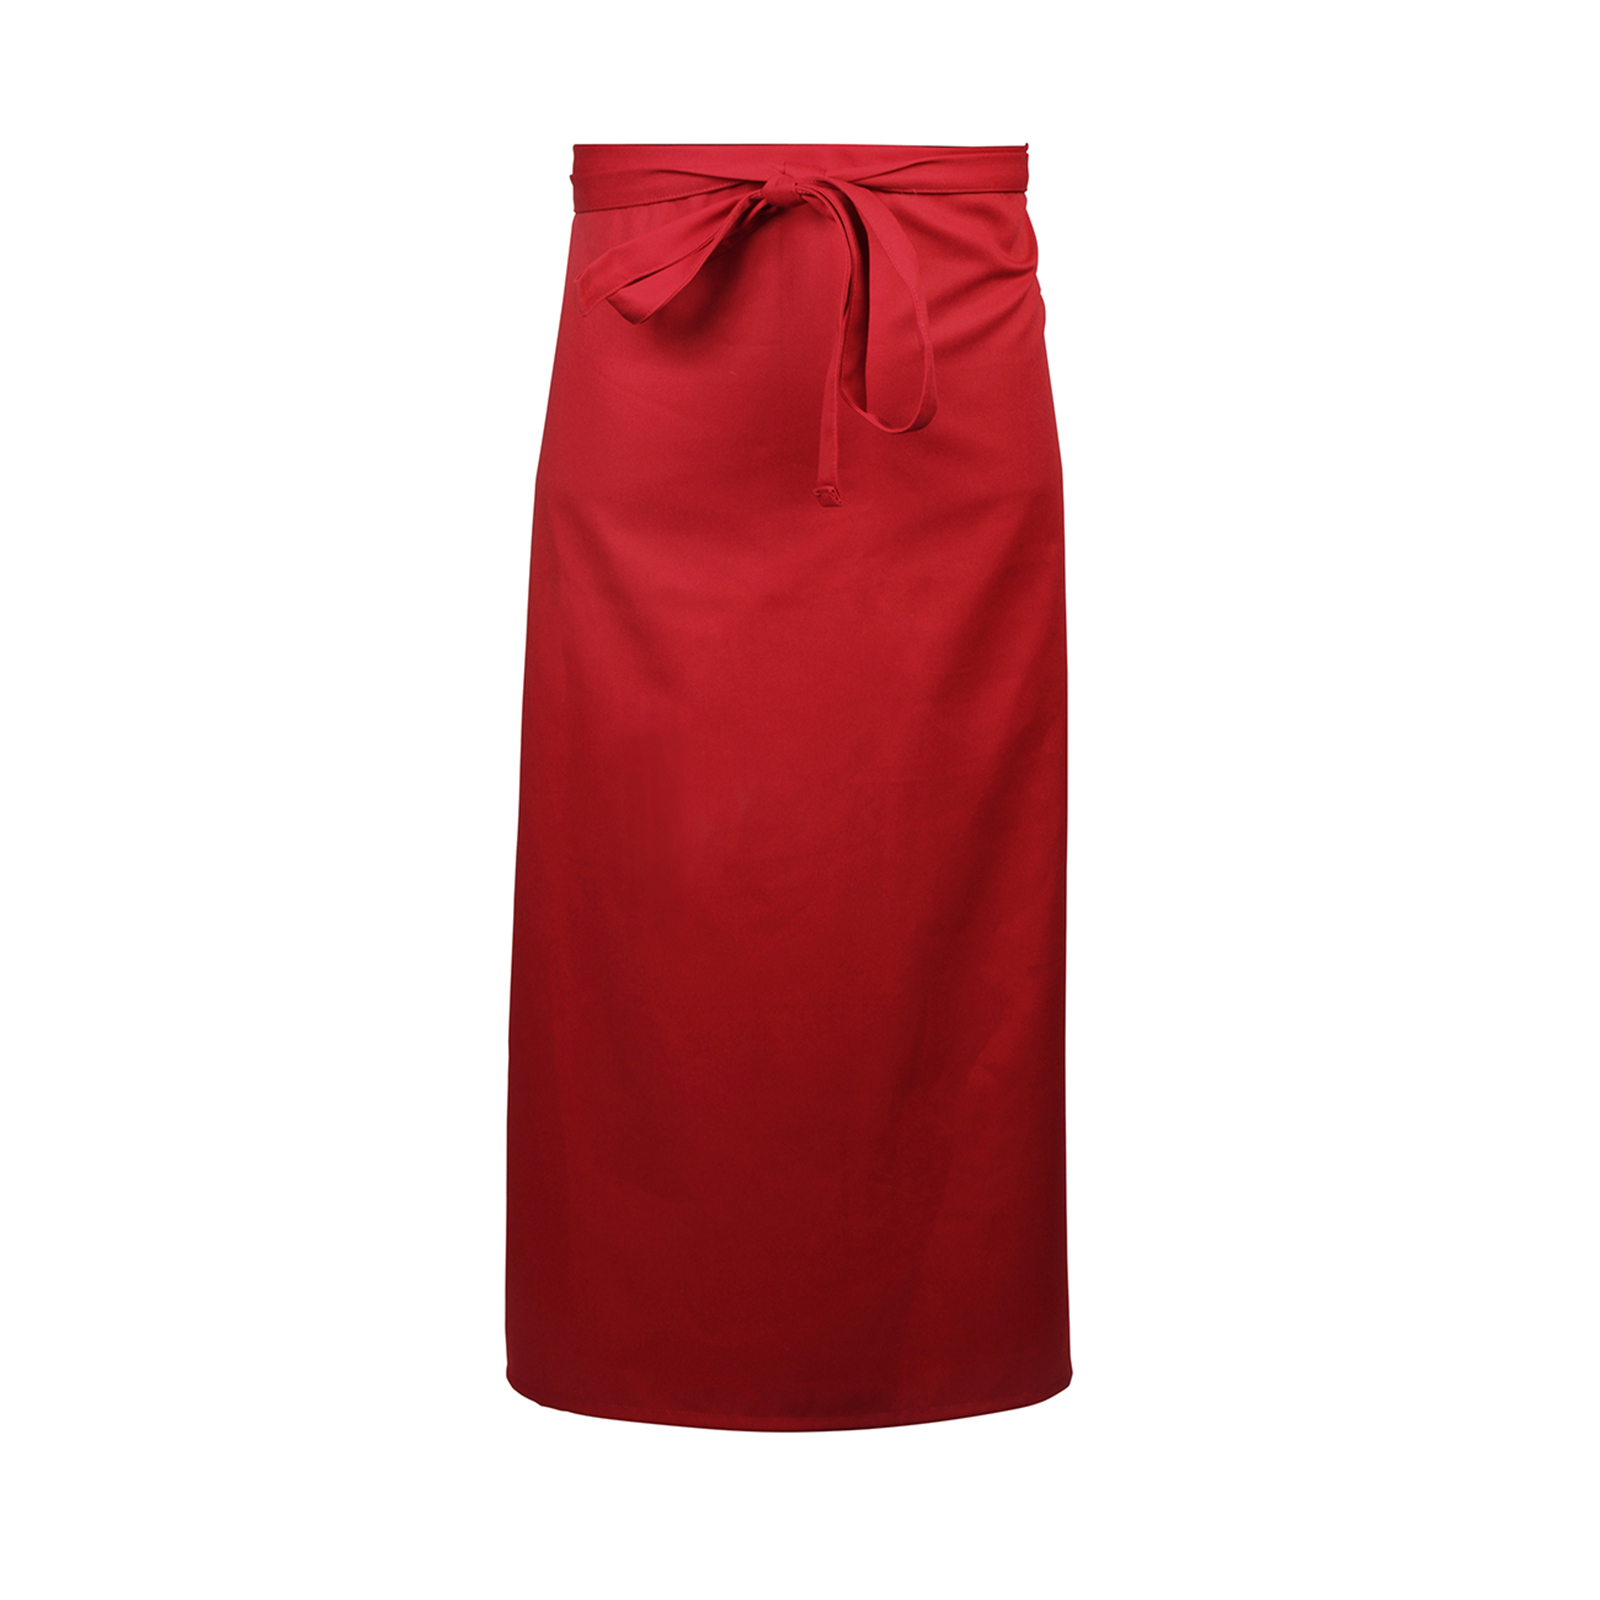 Mercer Culinary M61130RD waist apron